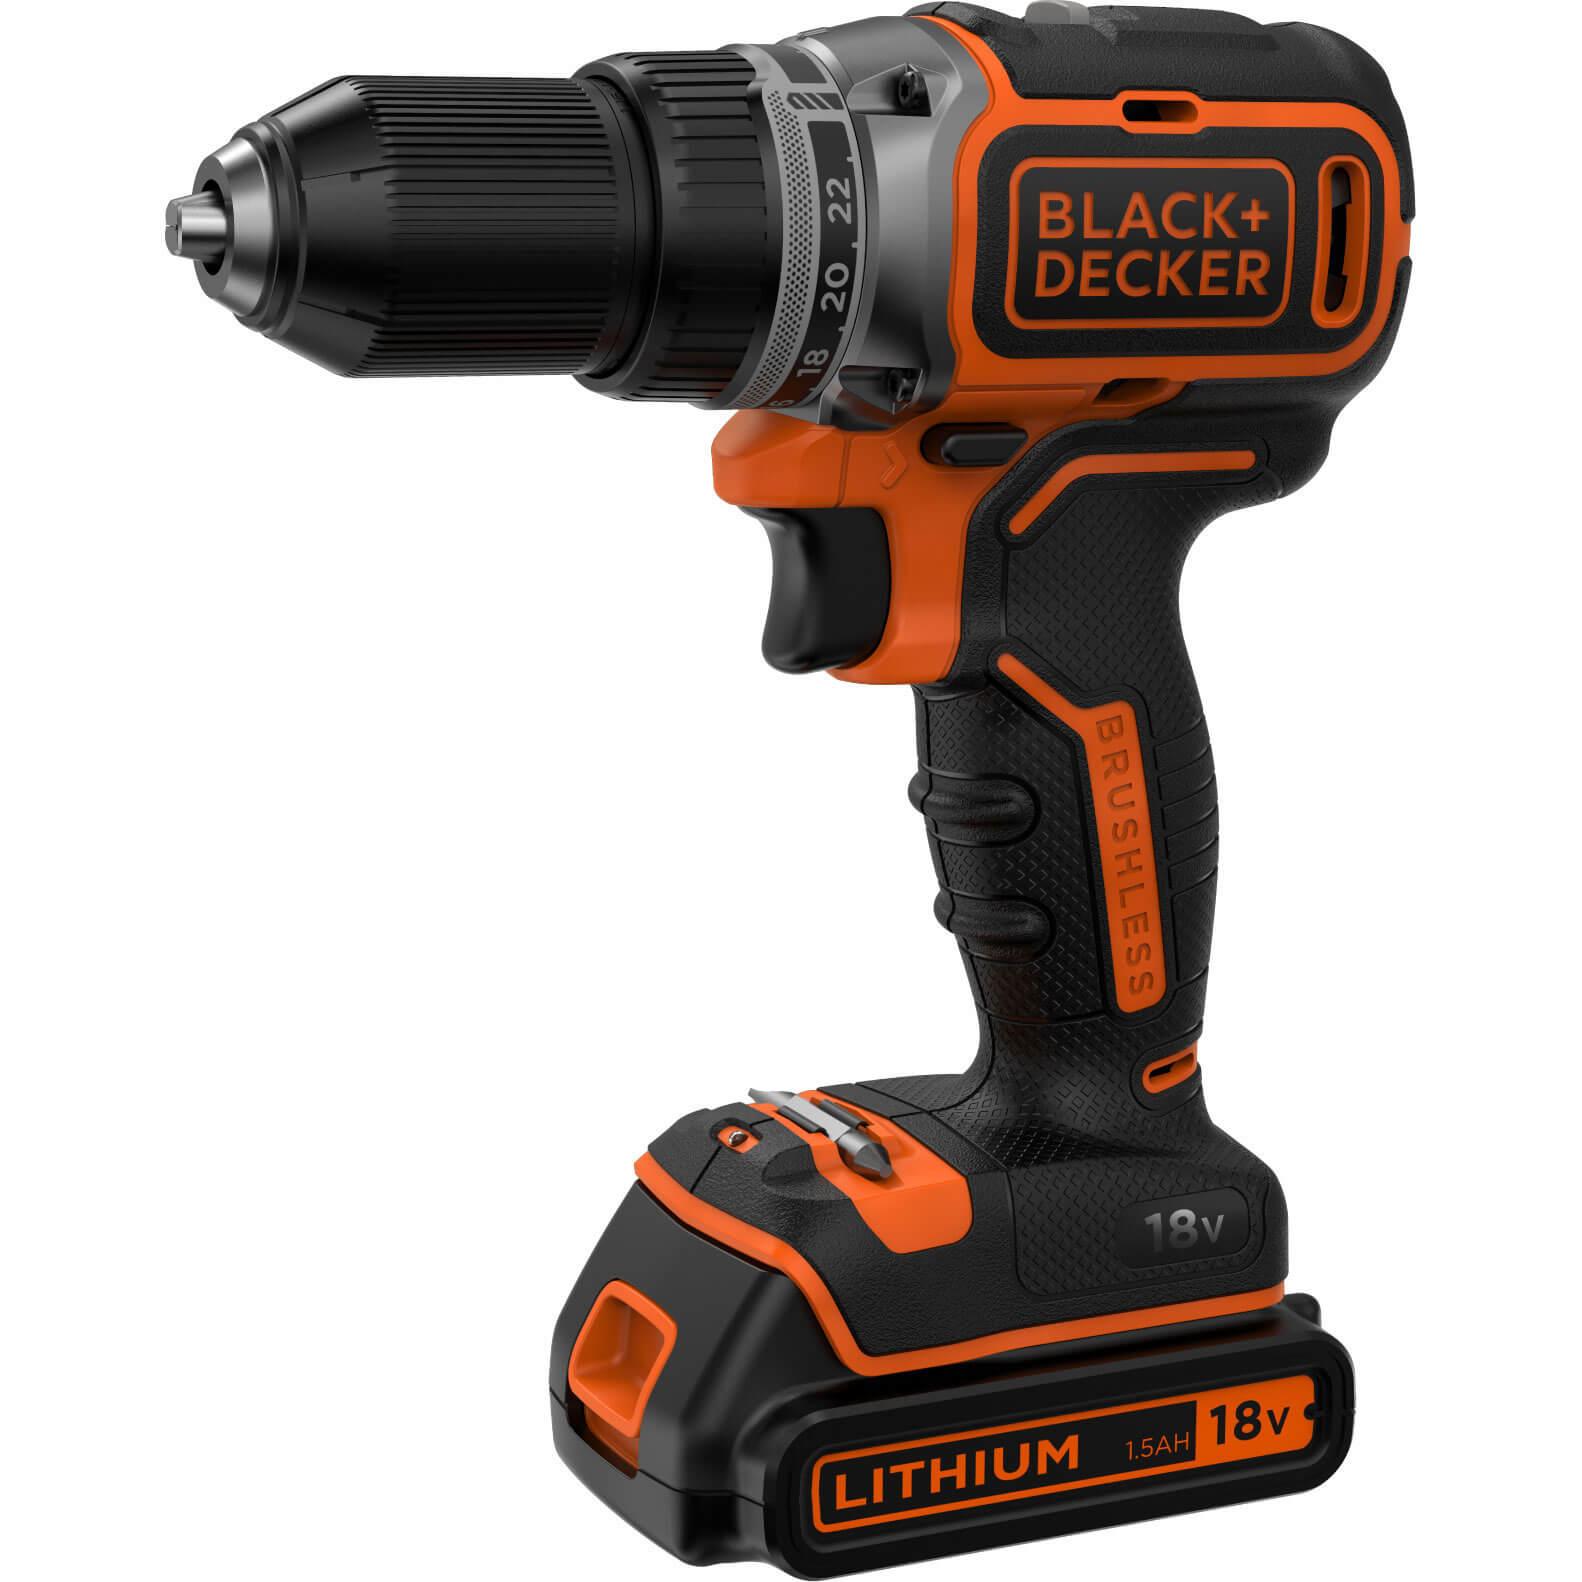 Black & Decker BL186 18v Cordless Drill Driver 1 x 1.5ah Liion Charger No Case